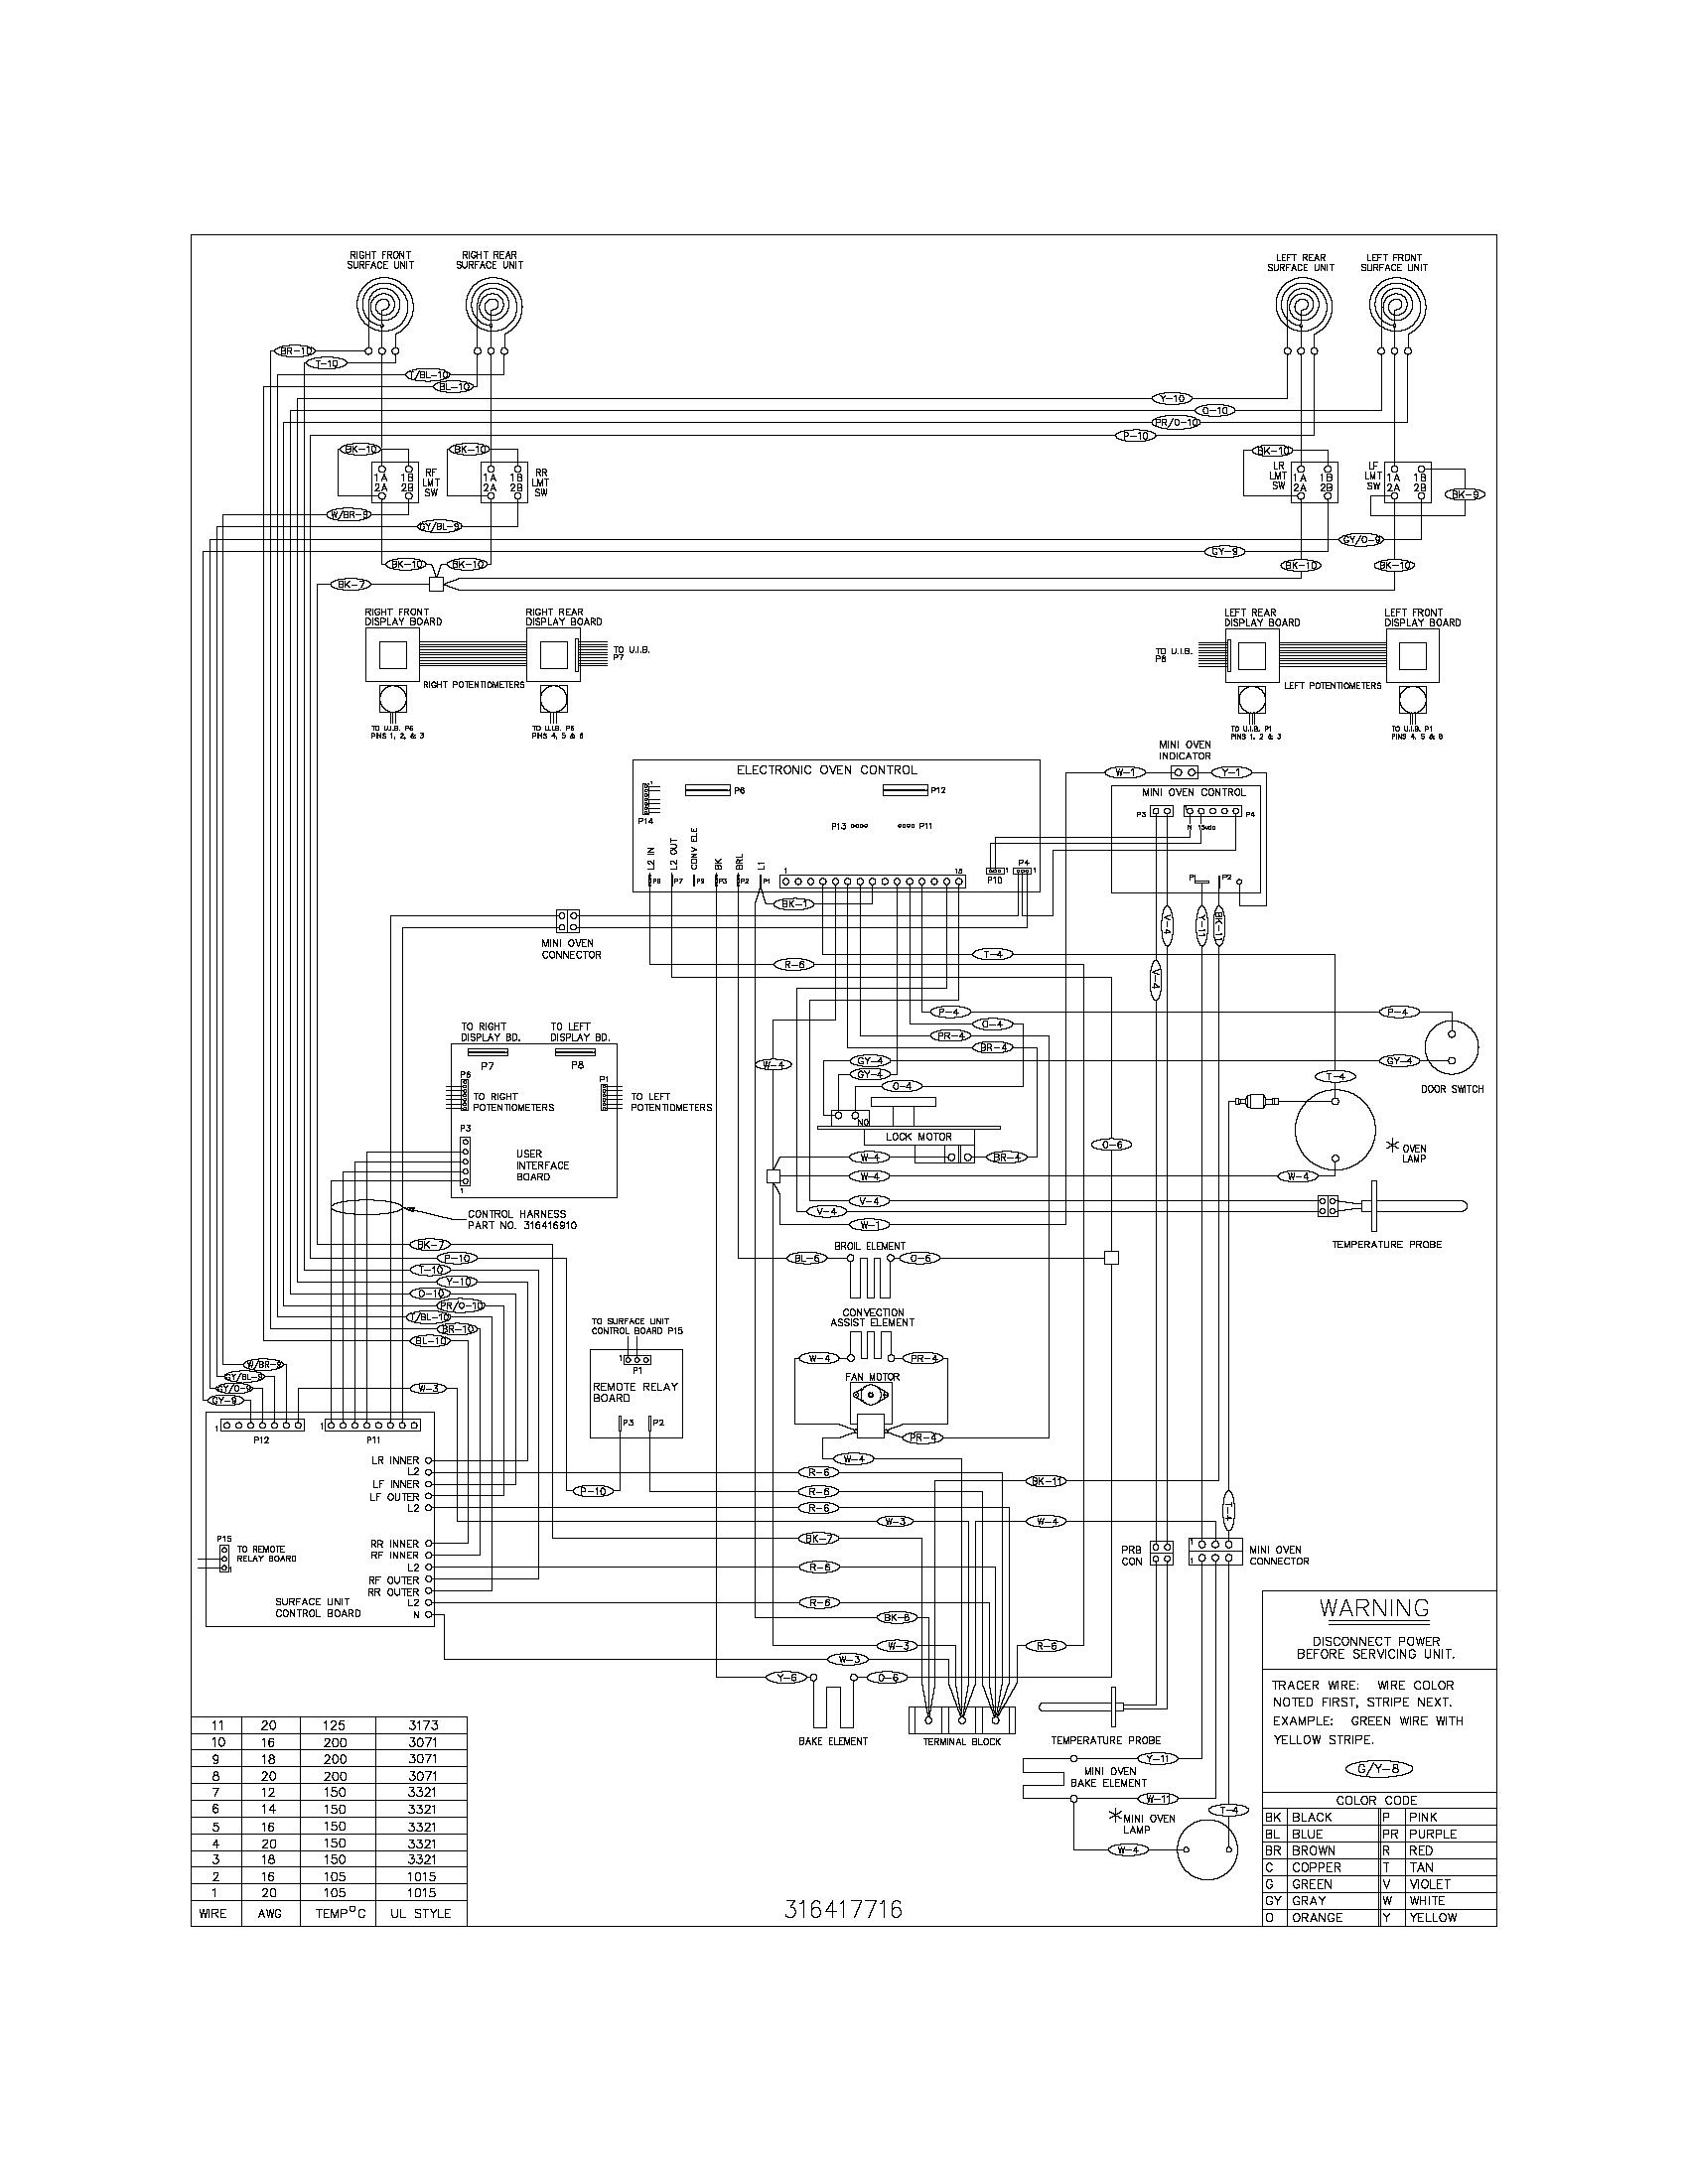 Frigidaire Glefm397dsb Electric Range Timer